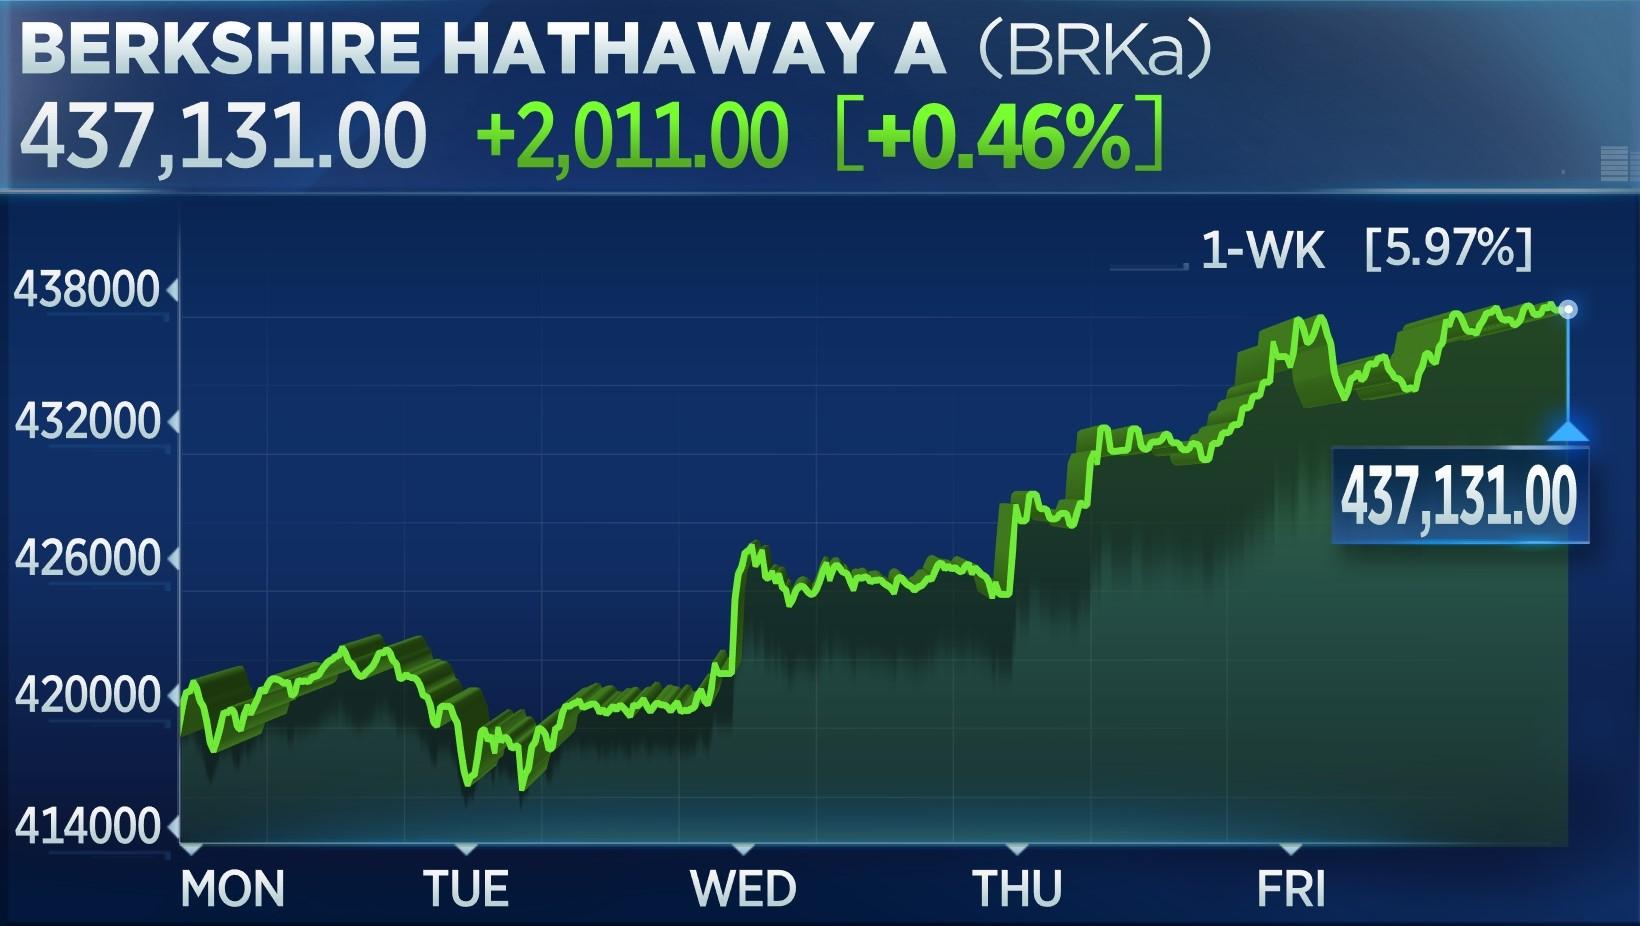 Berkshire Hathaway 1-week chart: Up 5.97%